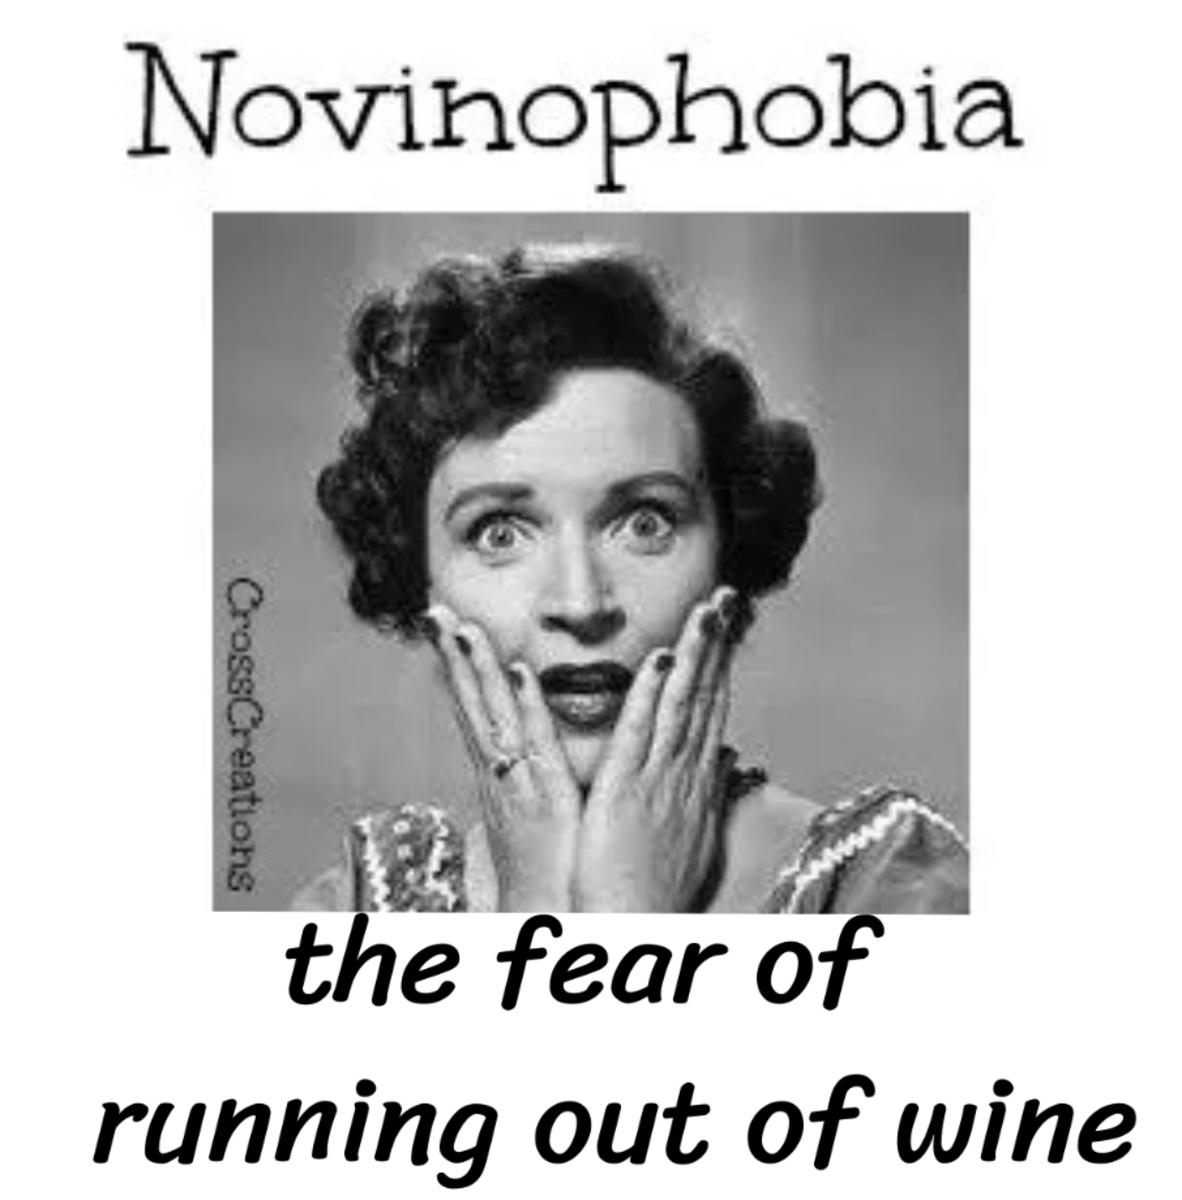 No more wine? OMG!